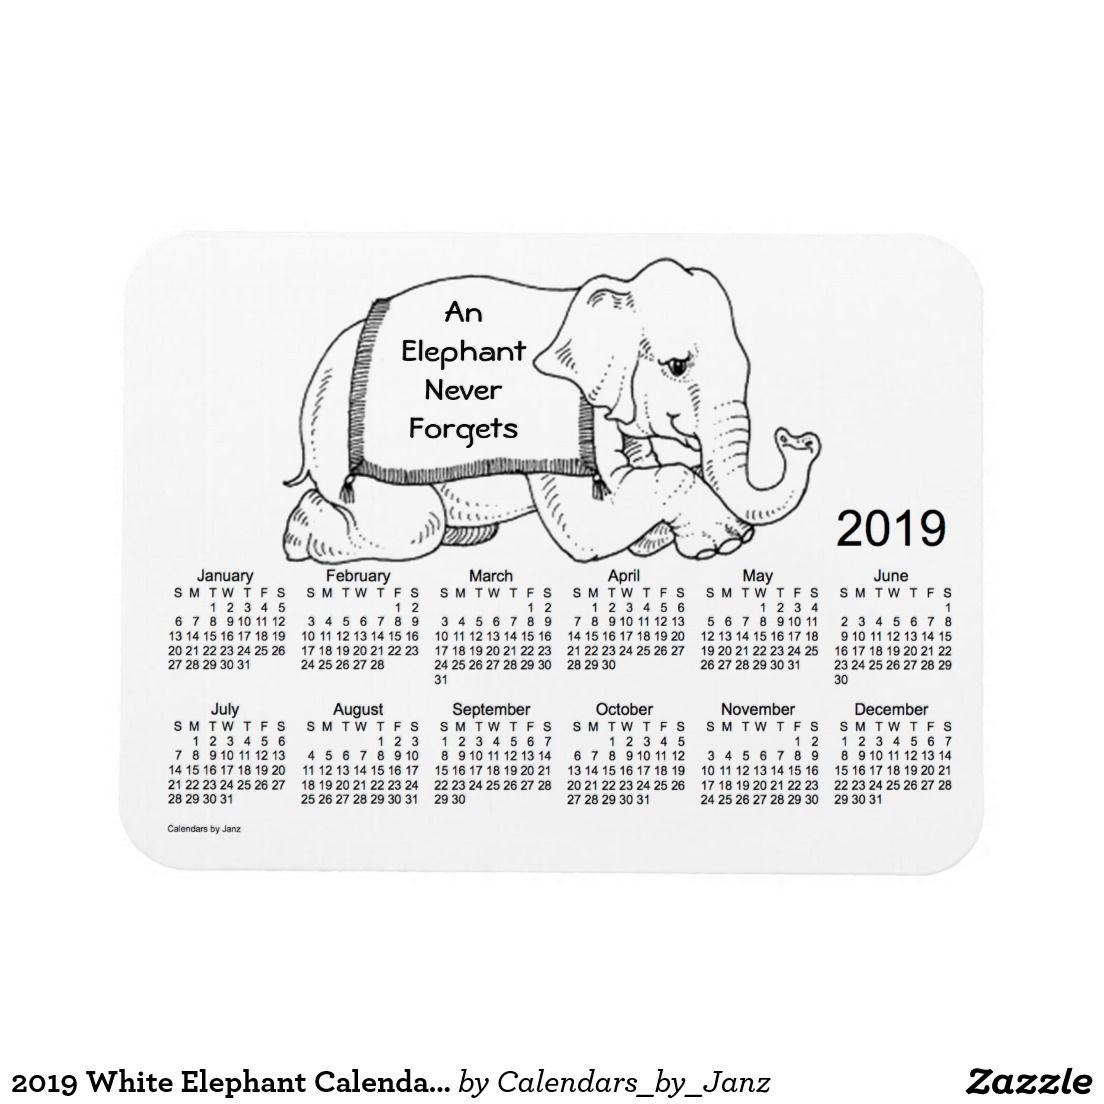 White Elephant Gift Ideas 2020 Pinterest 2019 White Elephant Calendar by Janz 3x4 Mag| W❤Pinterest